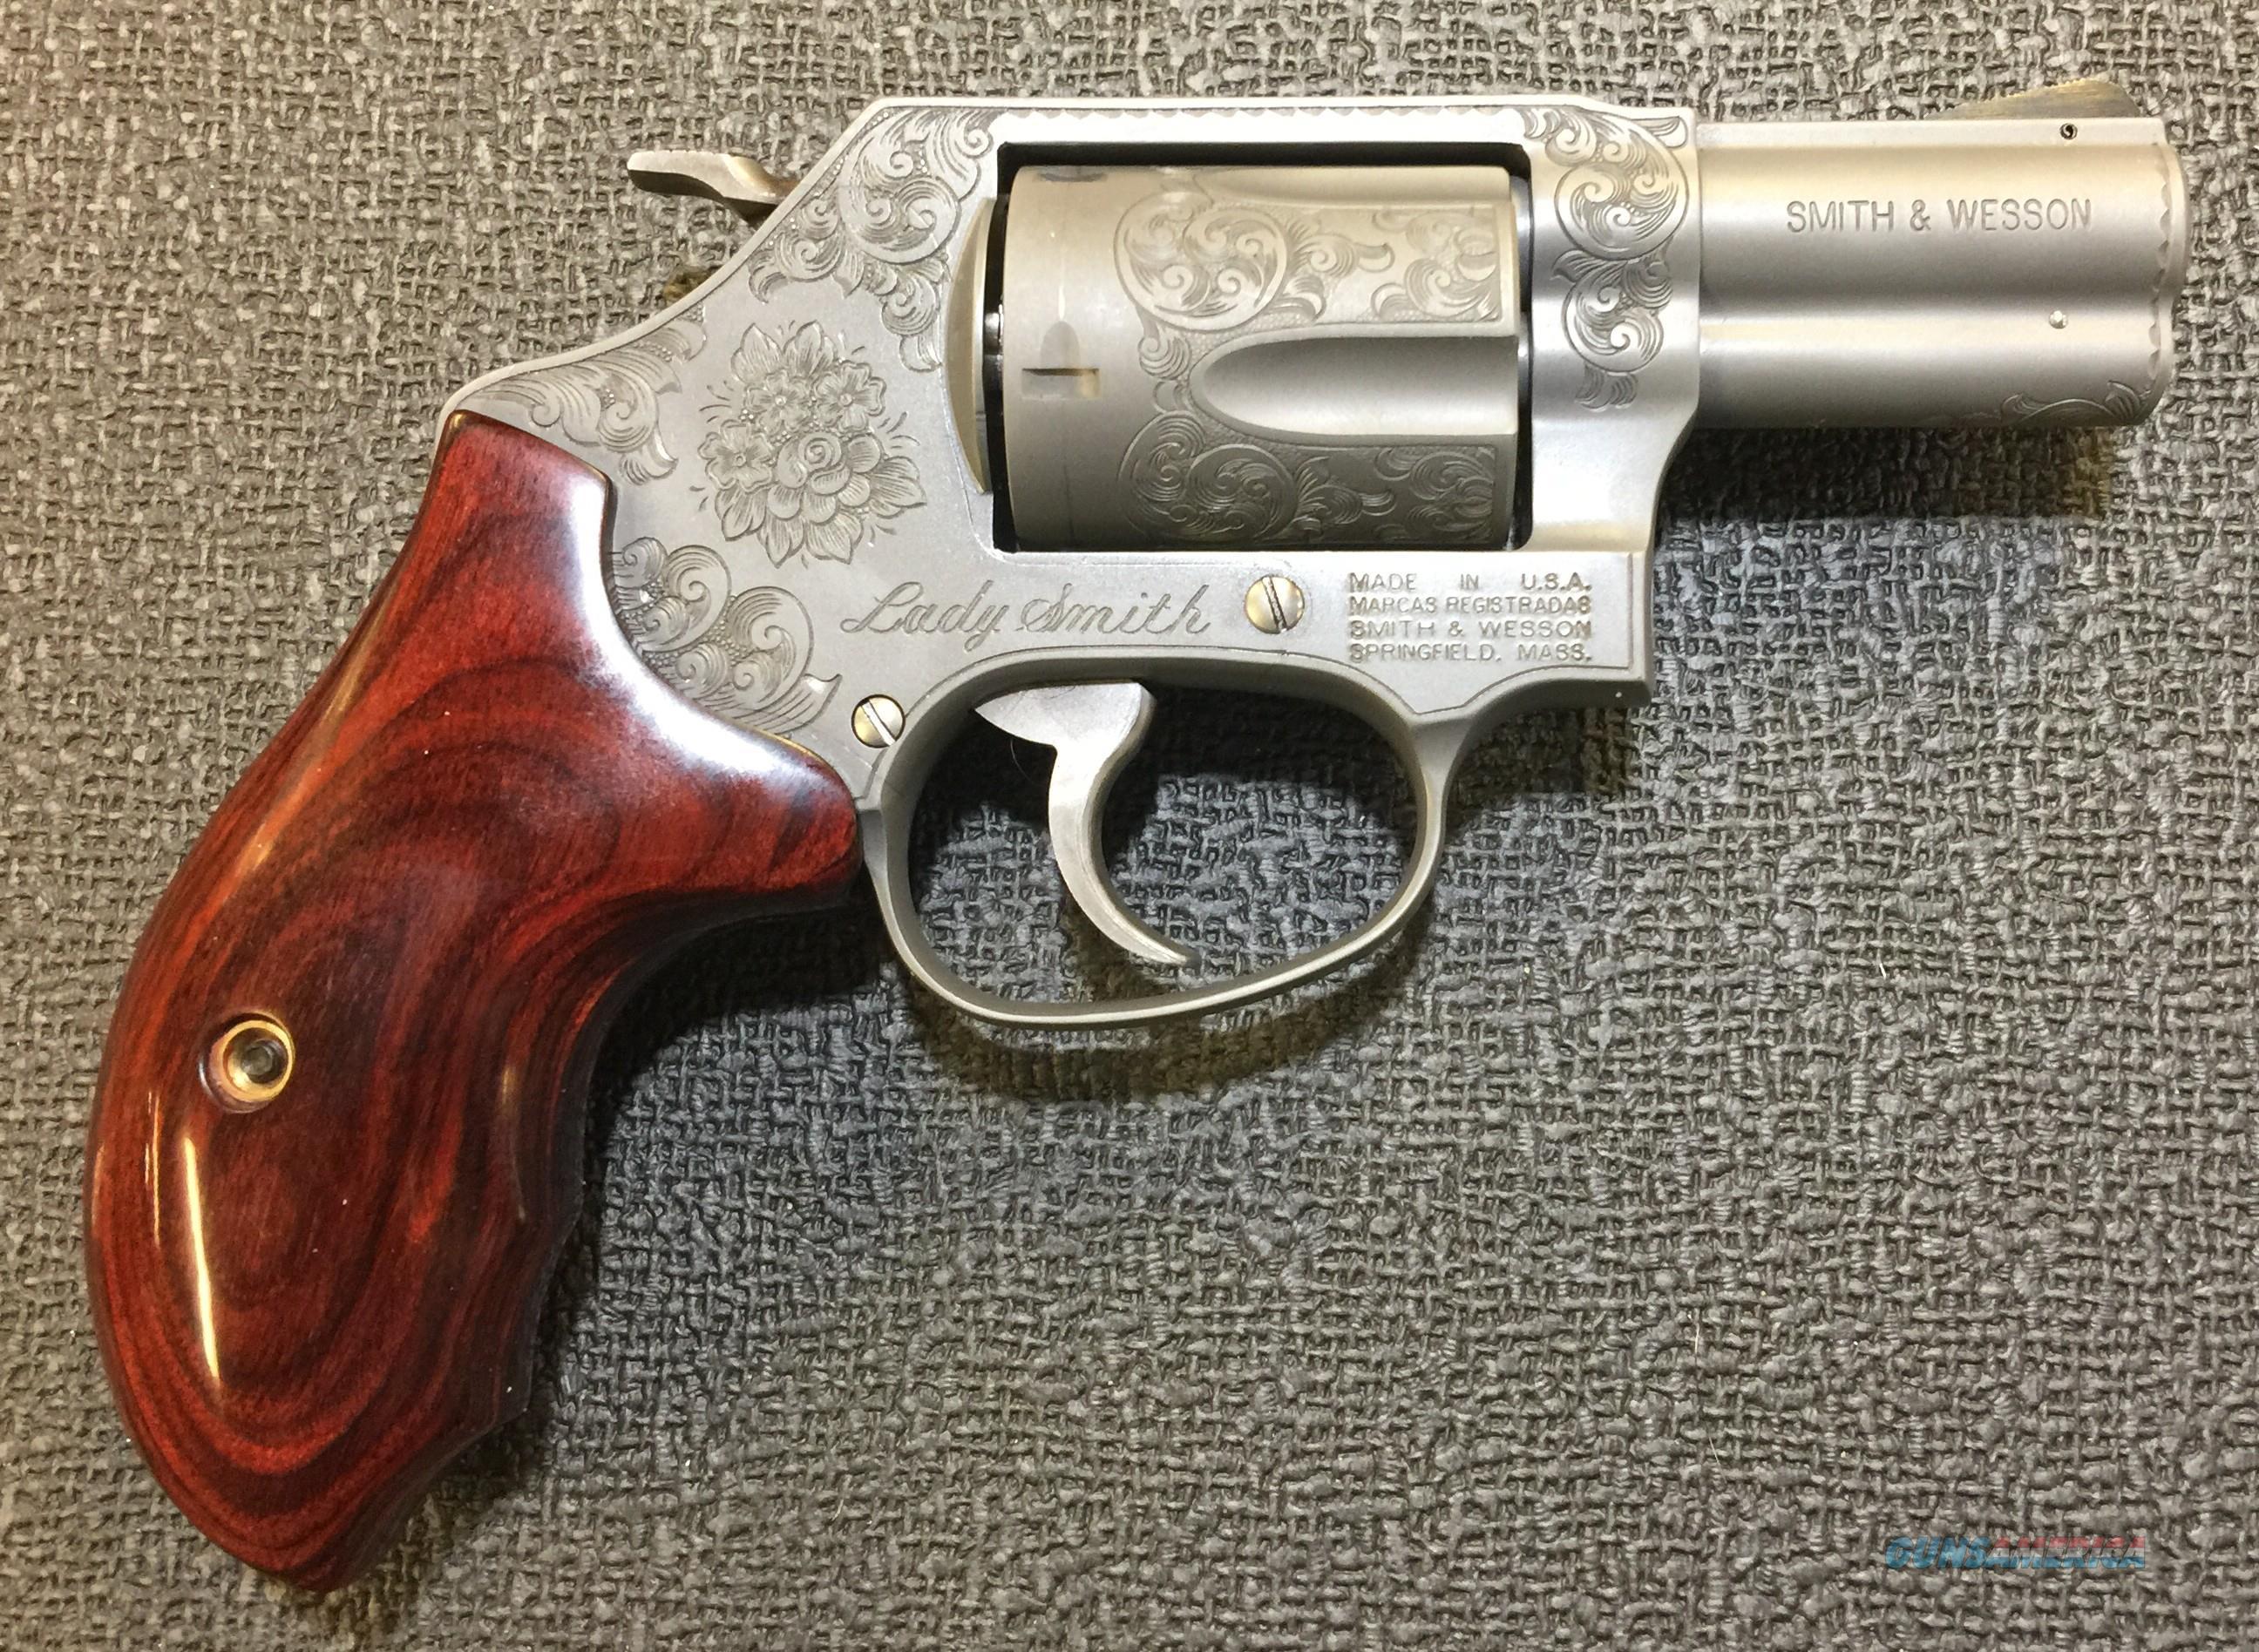 S&W M60-14 Ladysmith .357 Mag Custom Engraved by James White  Guns > Pistols > Smith & Wesson Revolvers > Small Frame ( J )